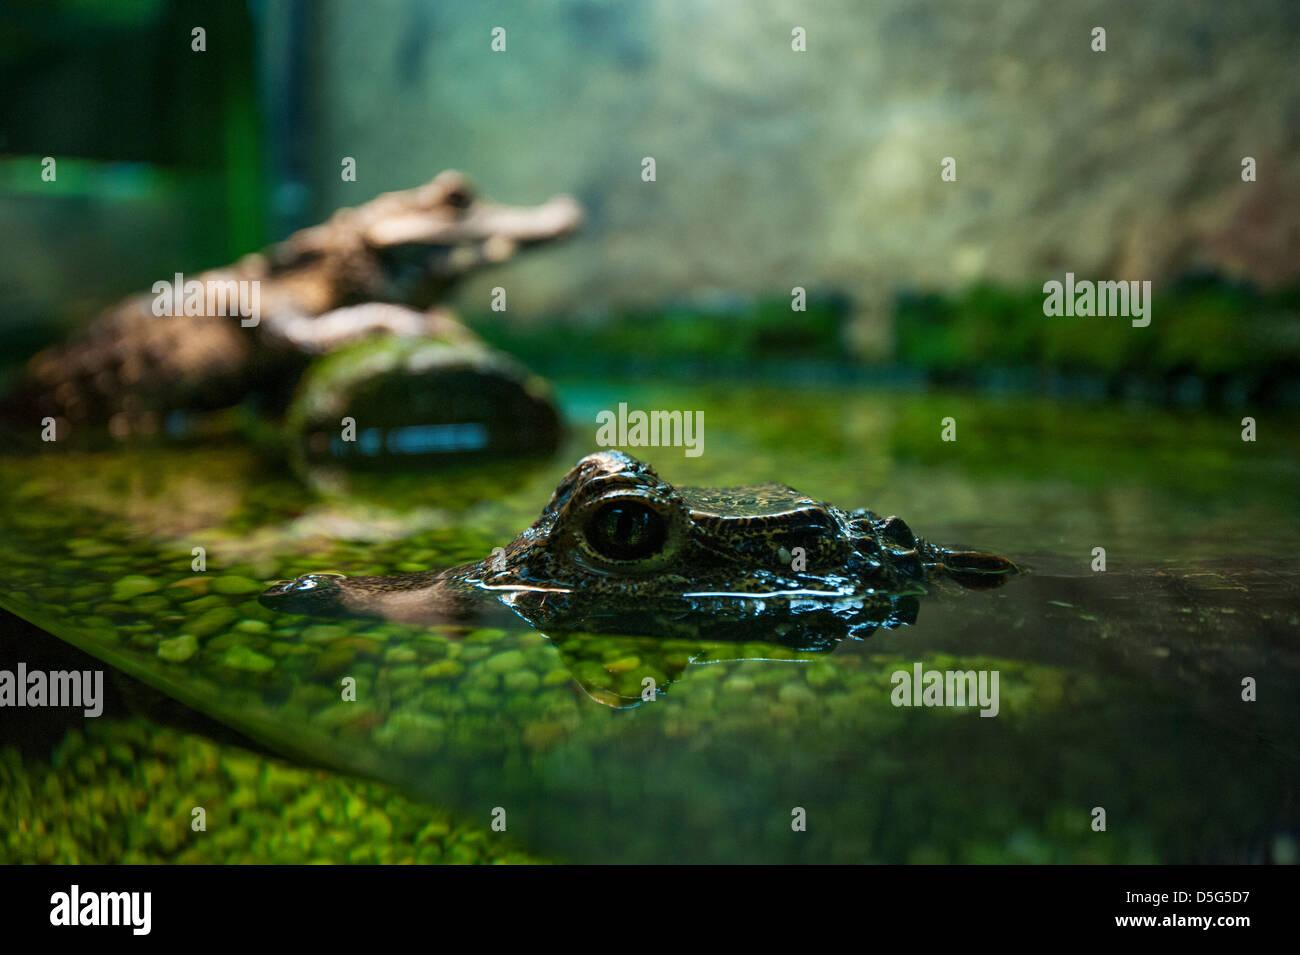 Captive alligators / crocodiles - Stock Image